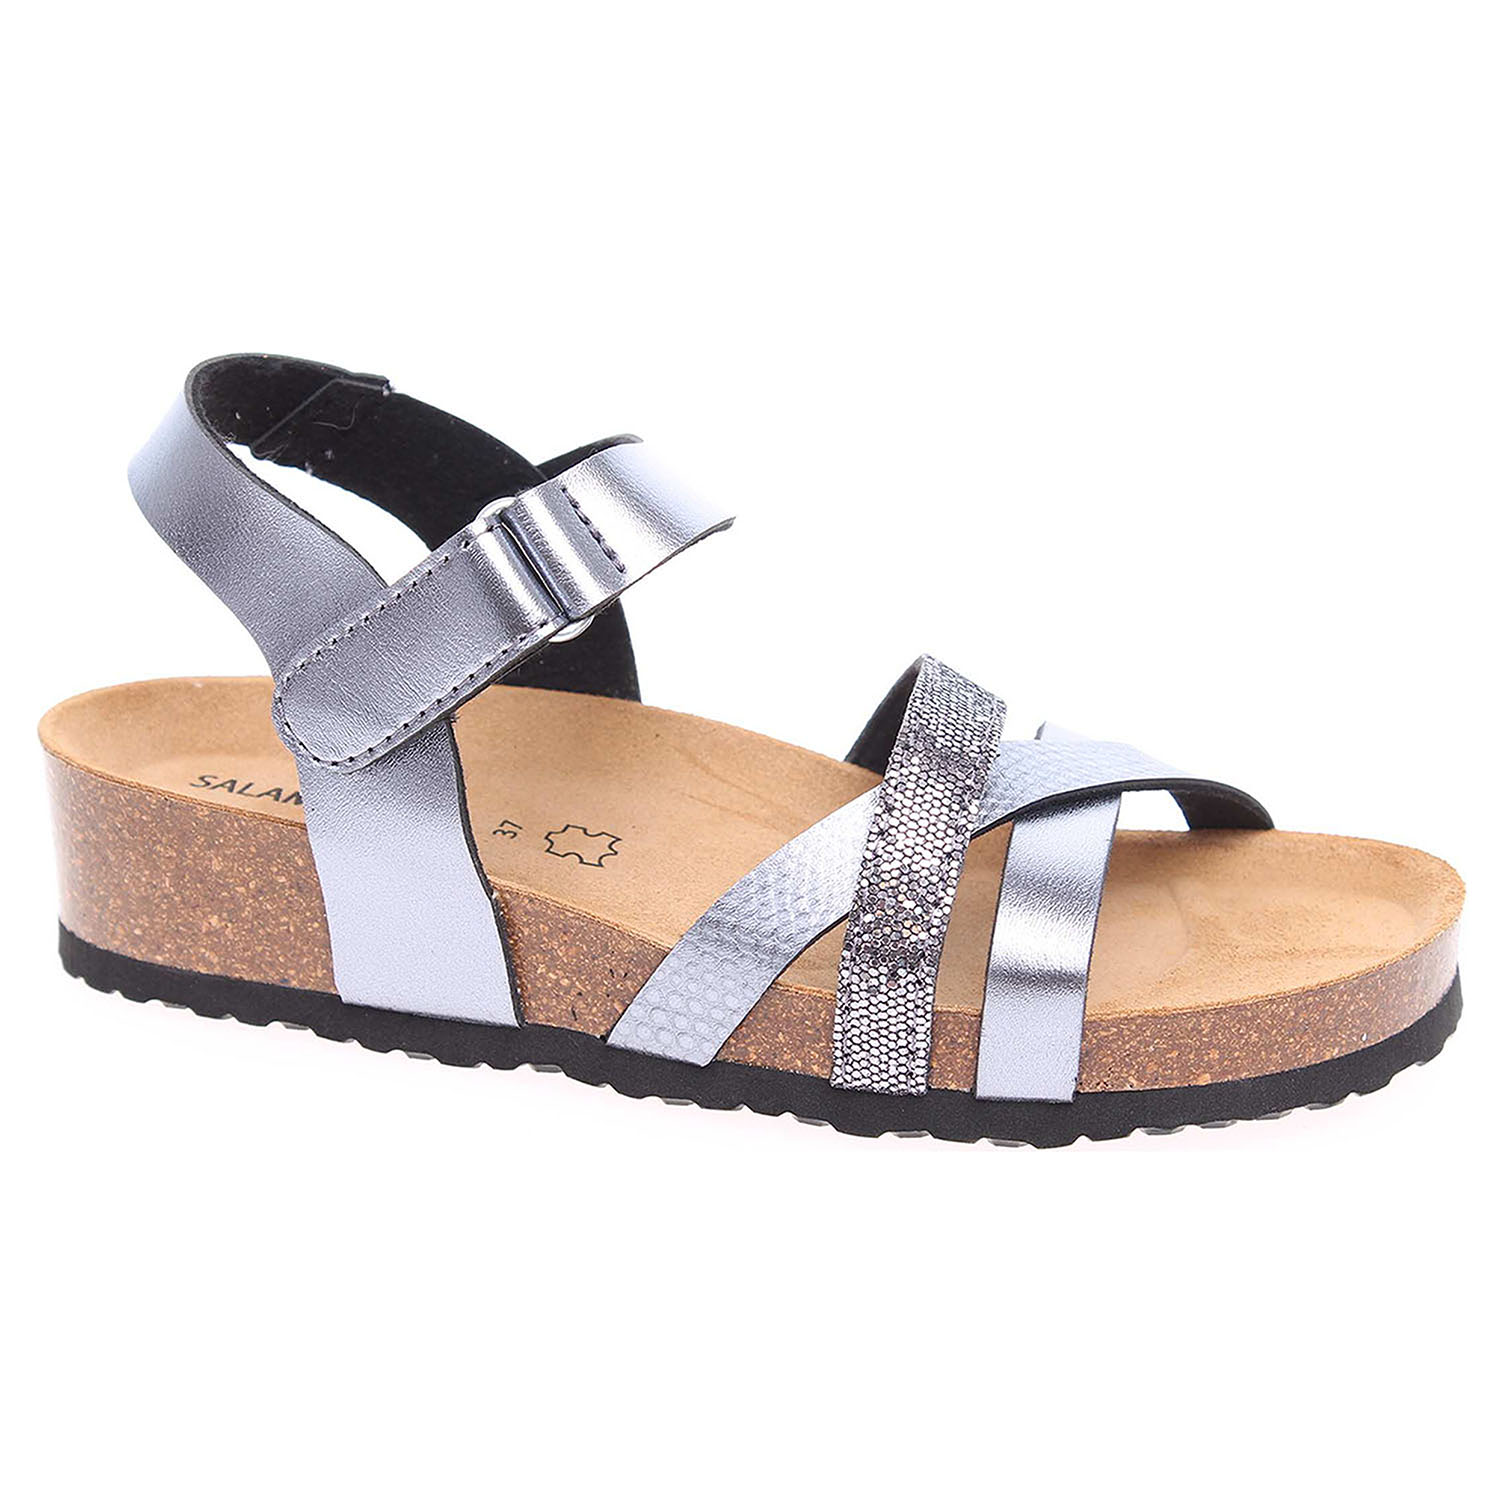 4ccd5a37d613 Ecco Dámské sandály Salamander 32-13103-35 anthrazit 23801264